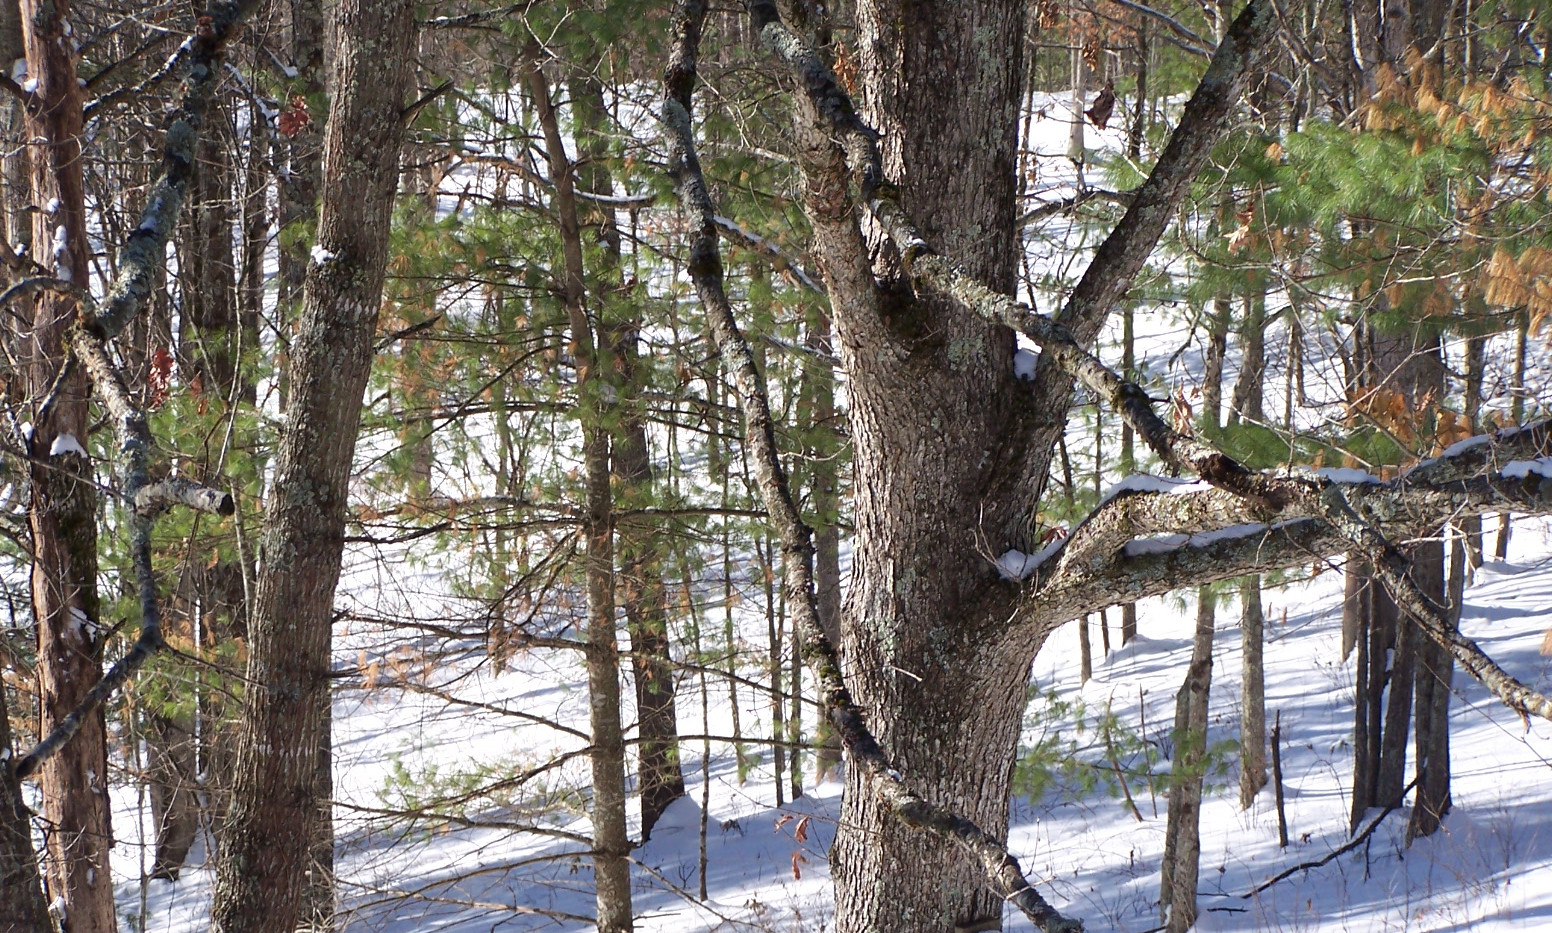 Winter in West Virginia, near ski resort